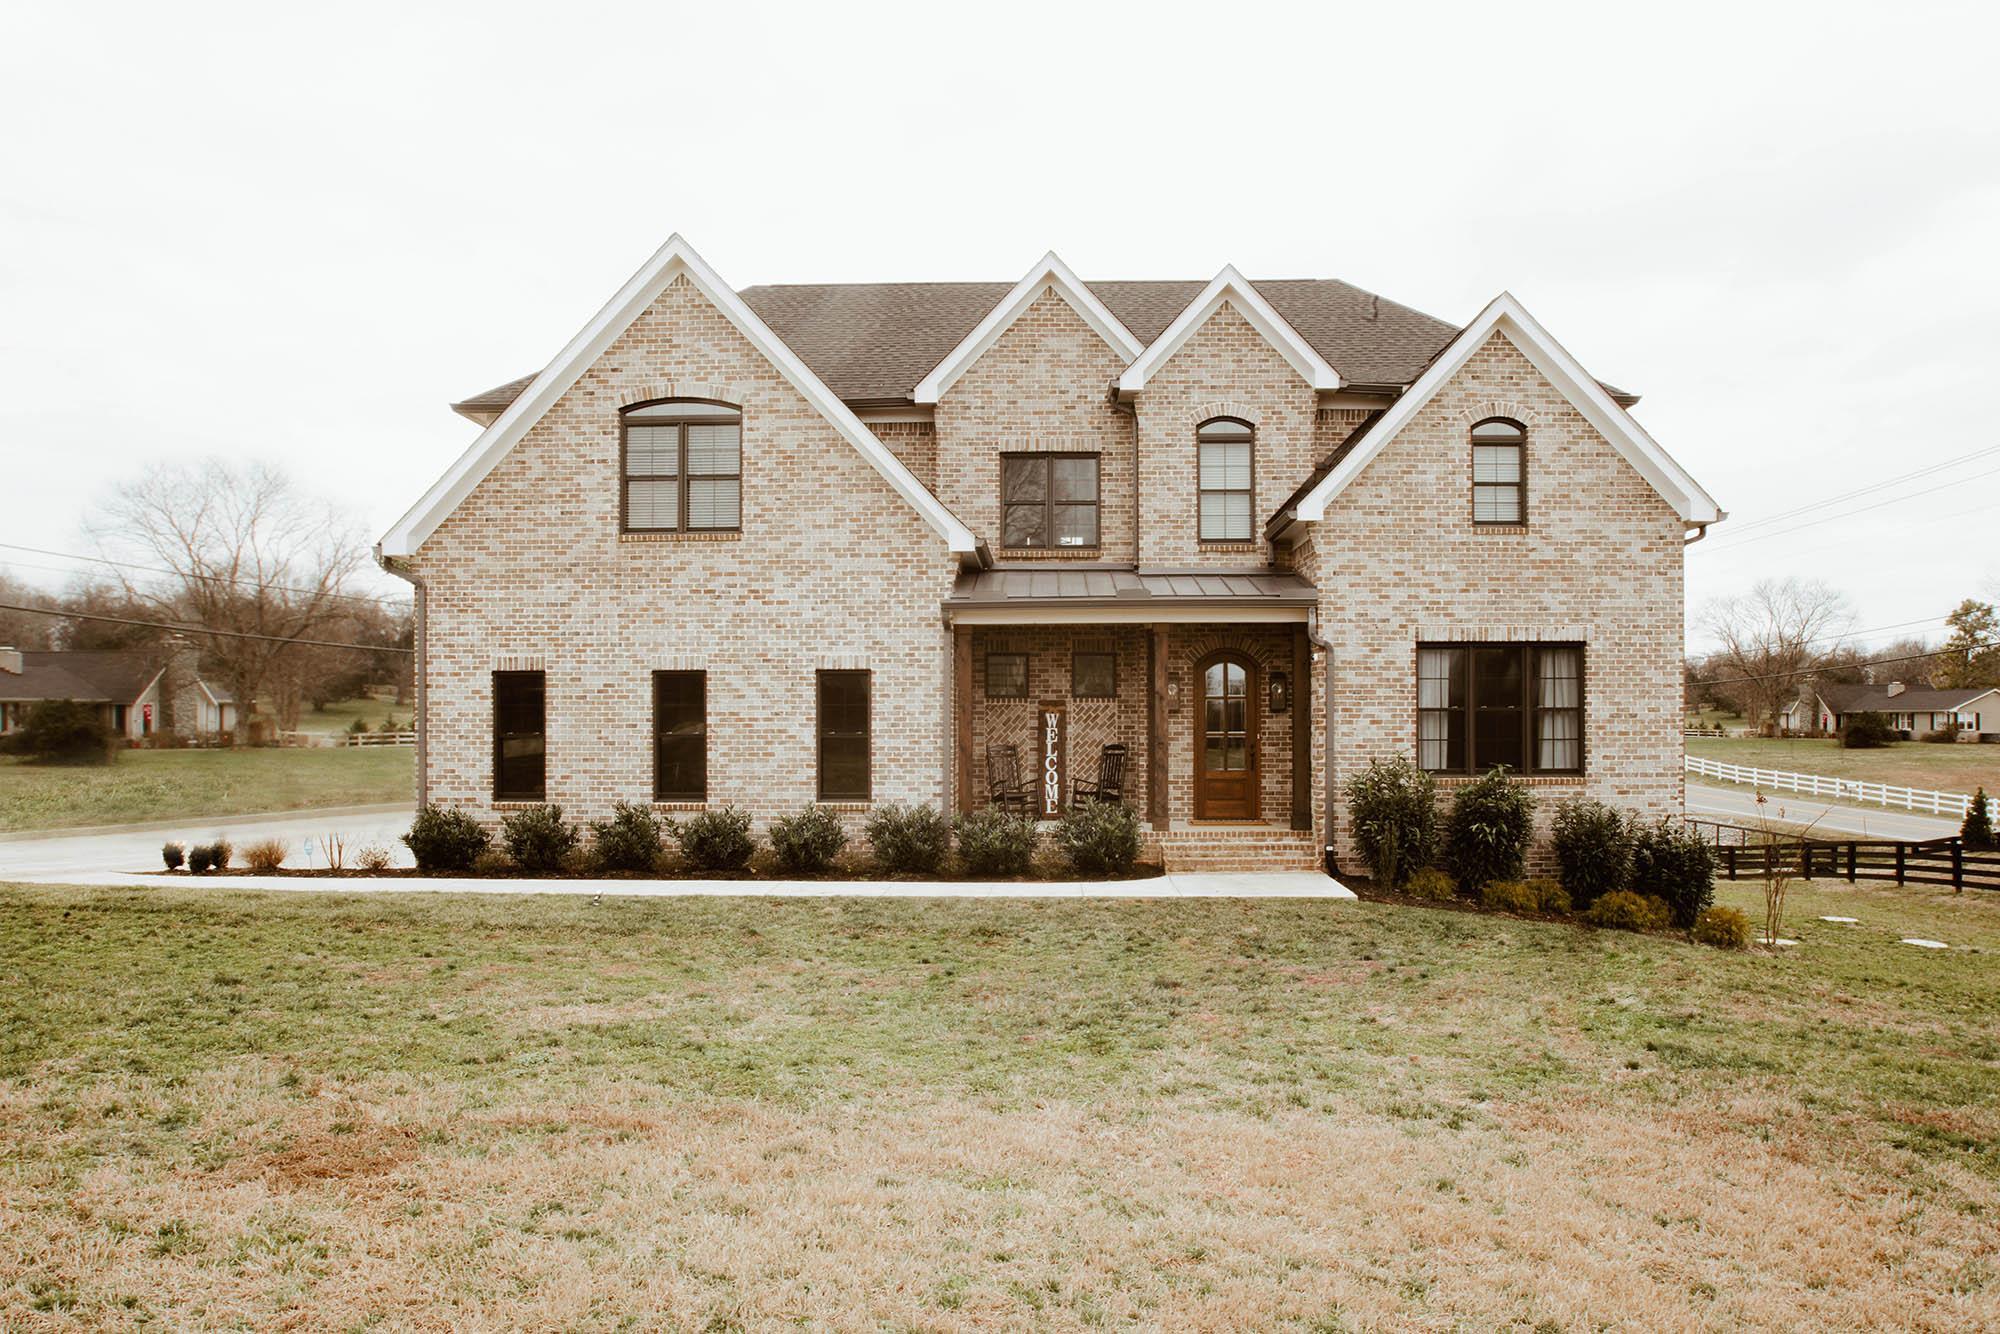 2103 Southern Preserve Lane, Franklin, TN 37064 - Franklin, TN real estate listing